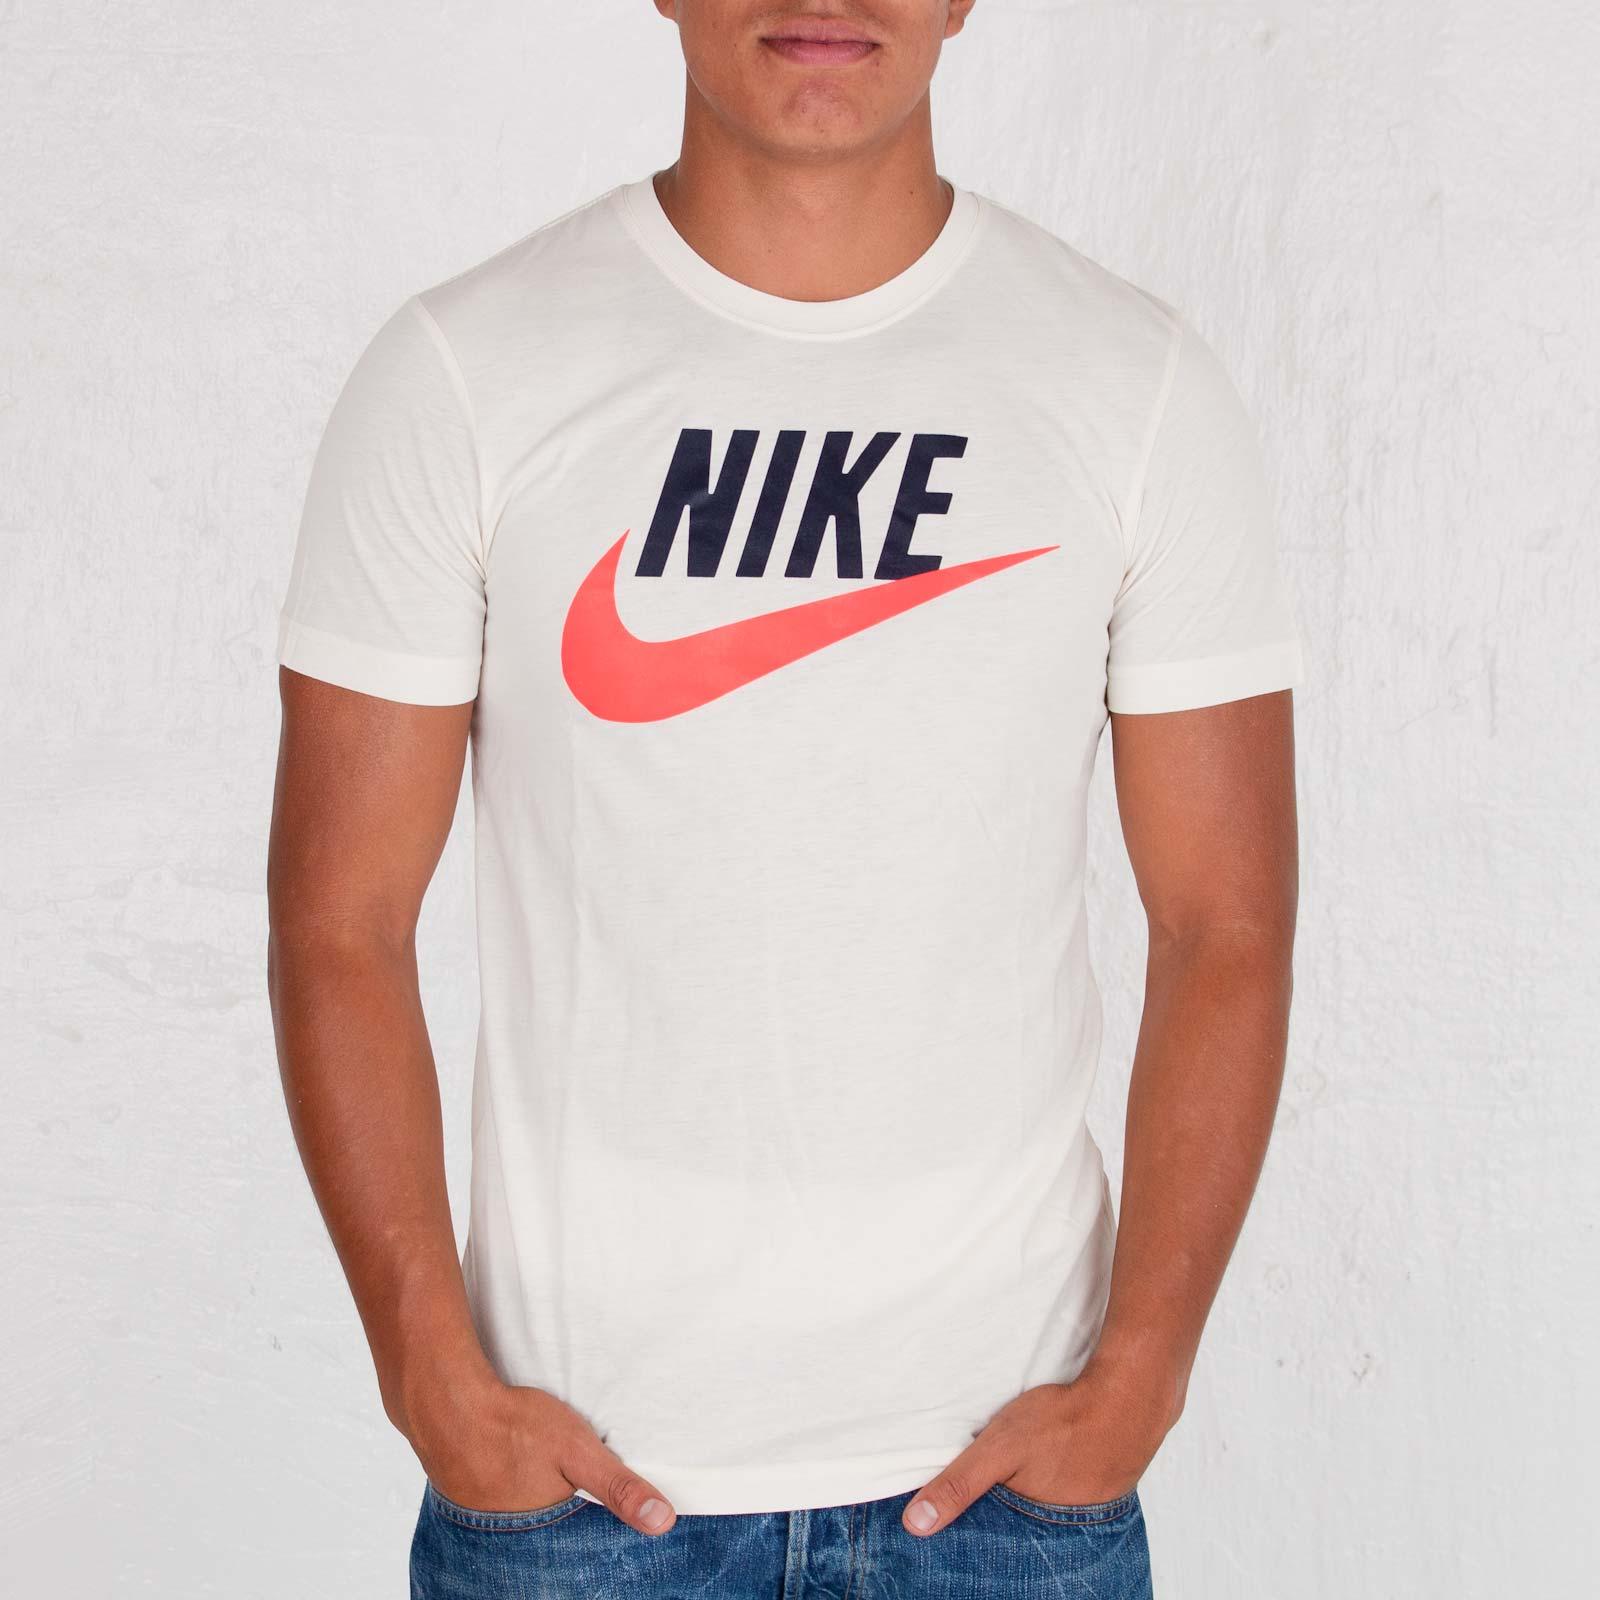 578aa8e06 Nike Sportswear Icon Tee - 110822 - Sneakersnstuff | sneakers ...